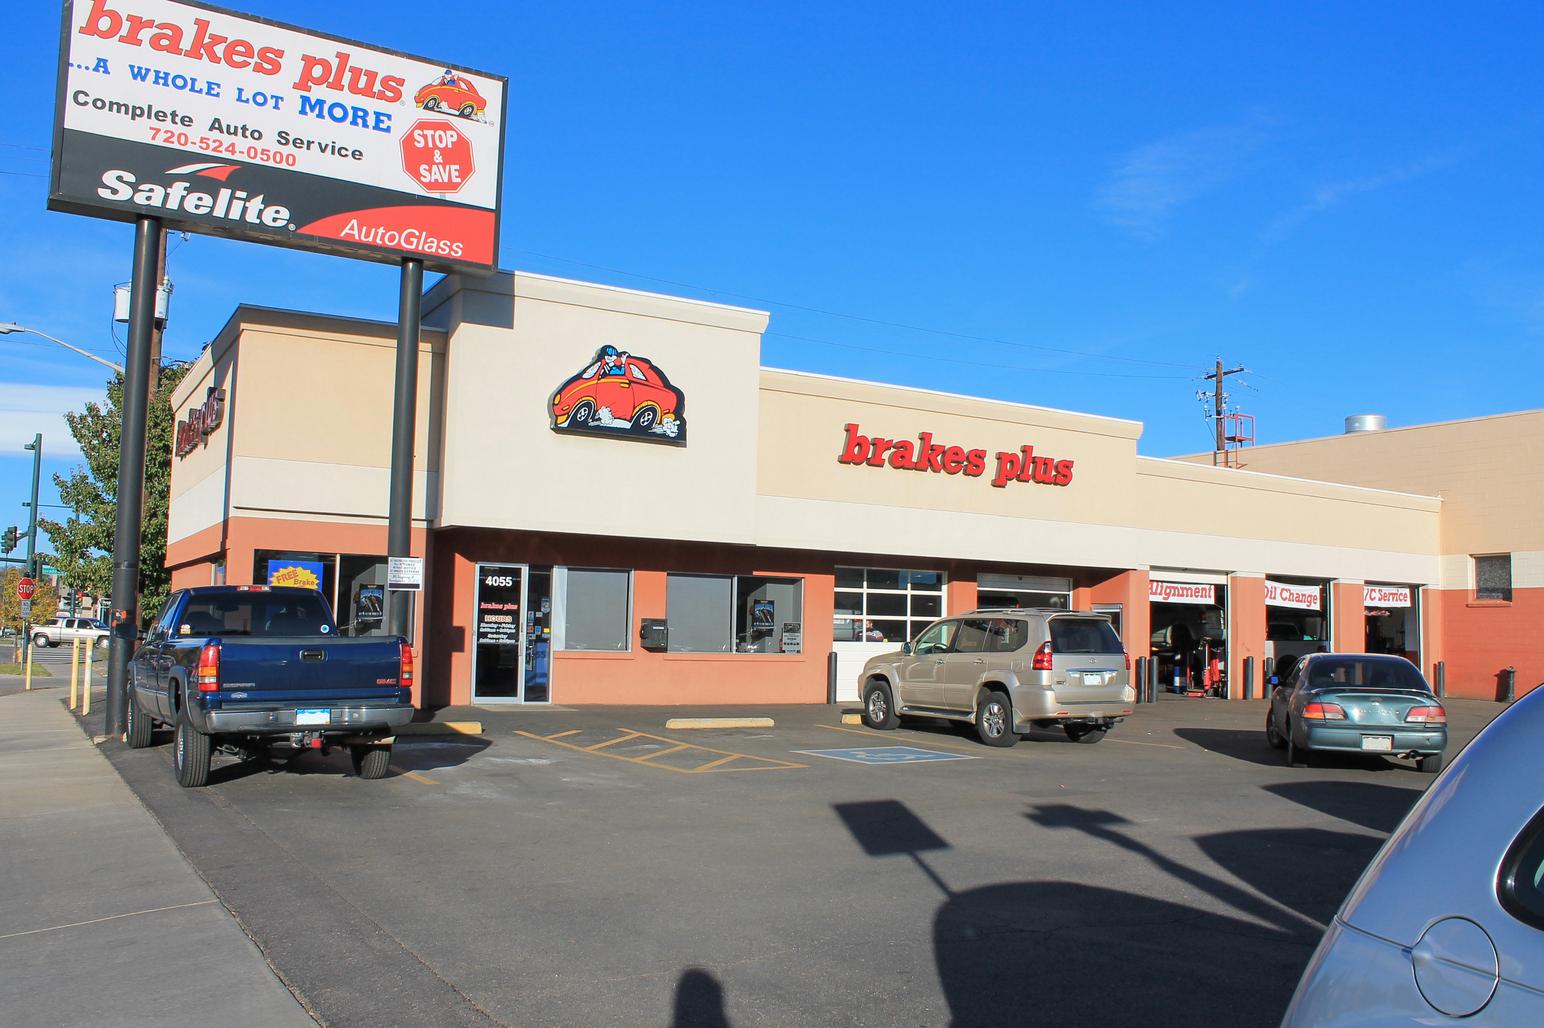 Brakes Plus at Denver, CO - University Hills